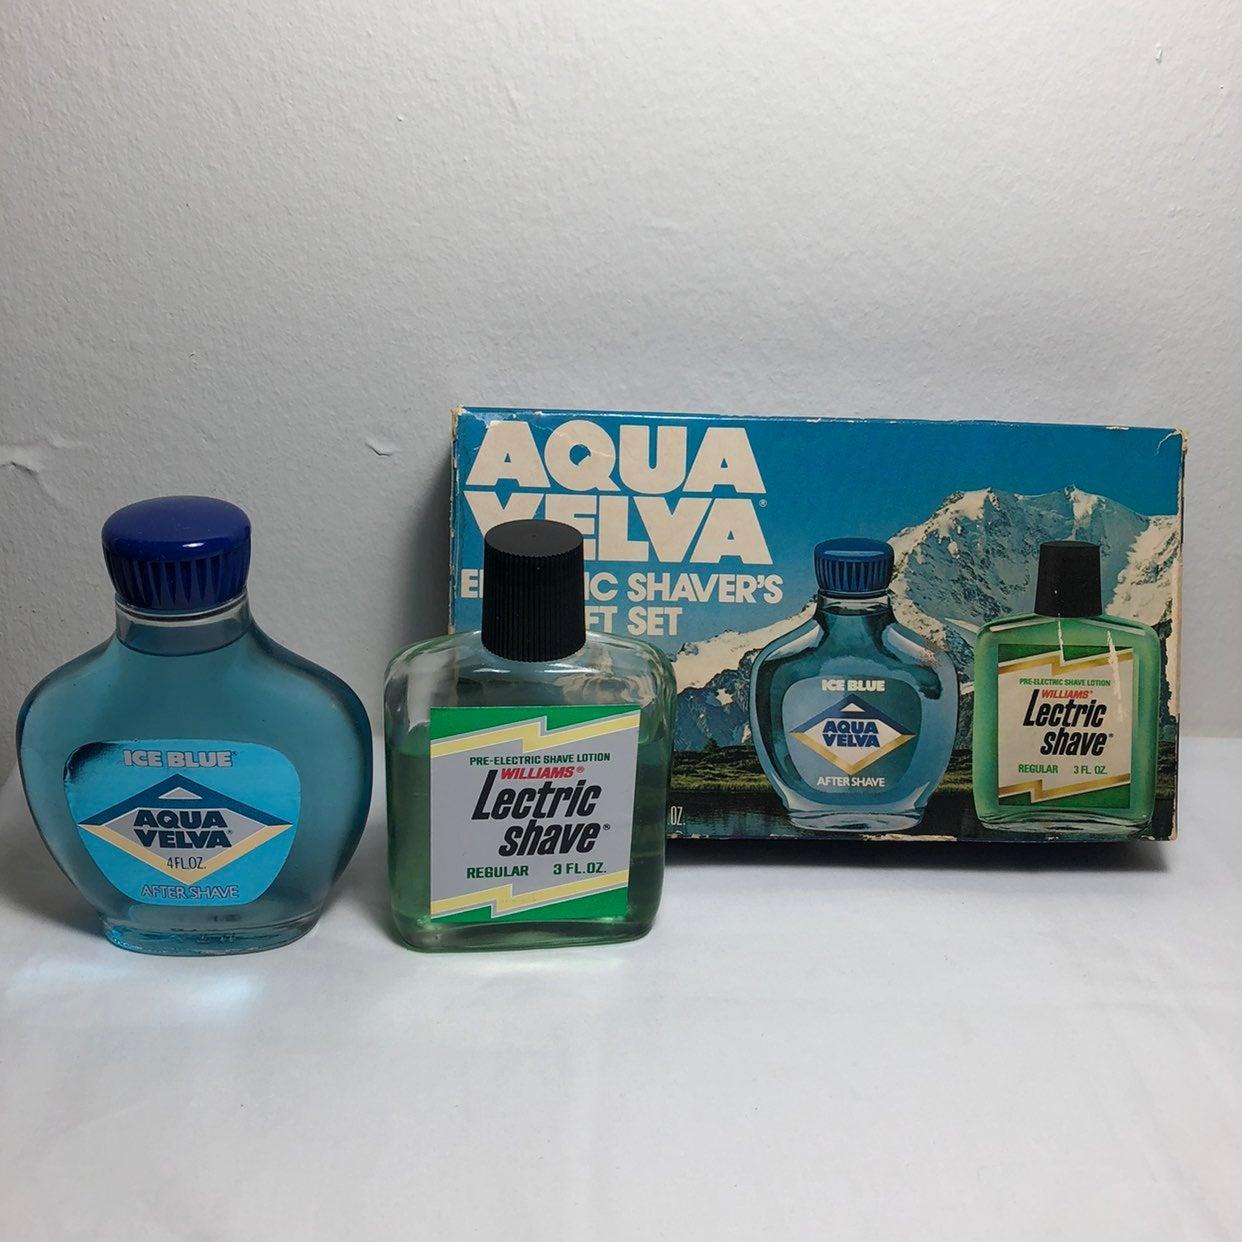 Aqua Vevla Ice Blue Lectric Shave